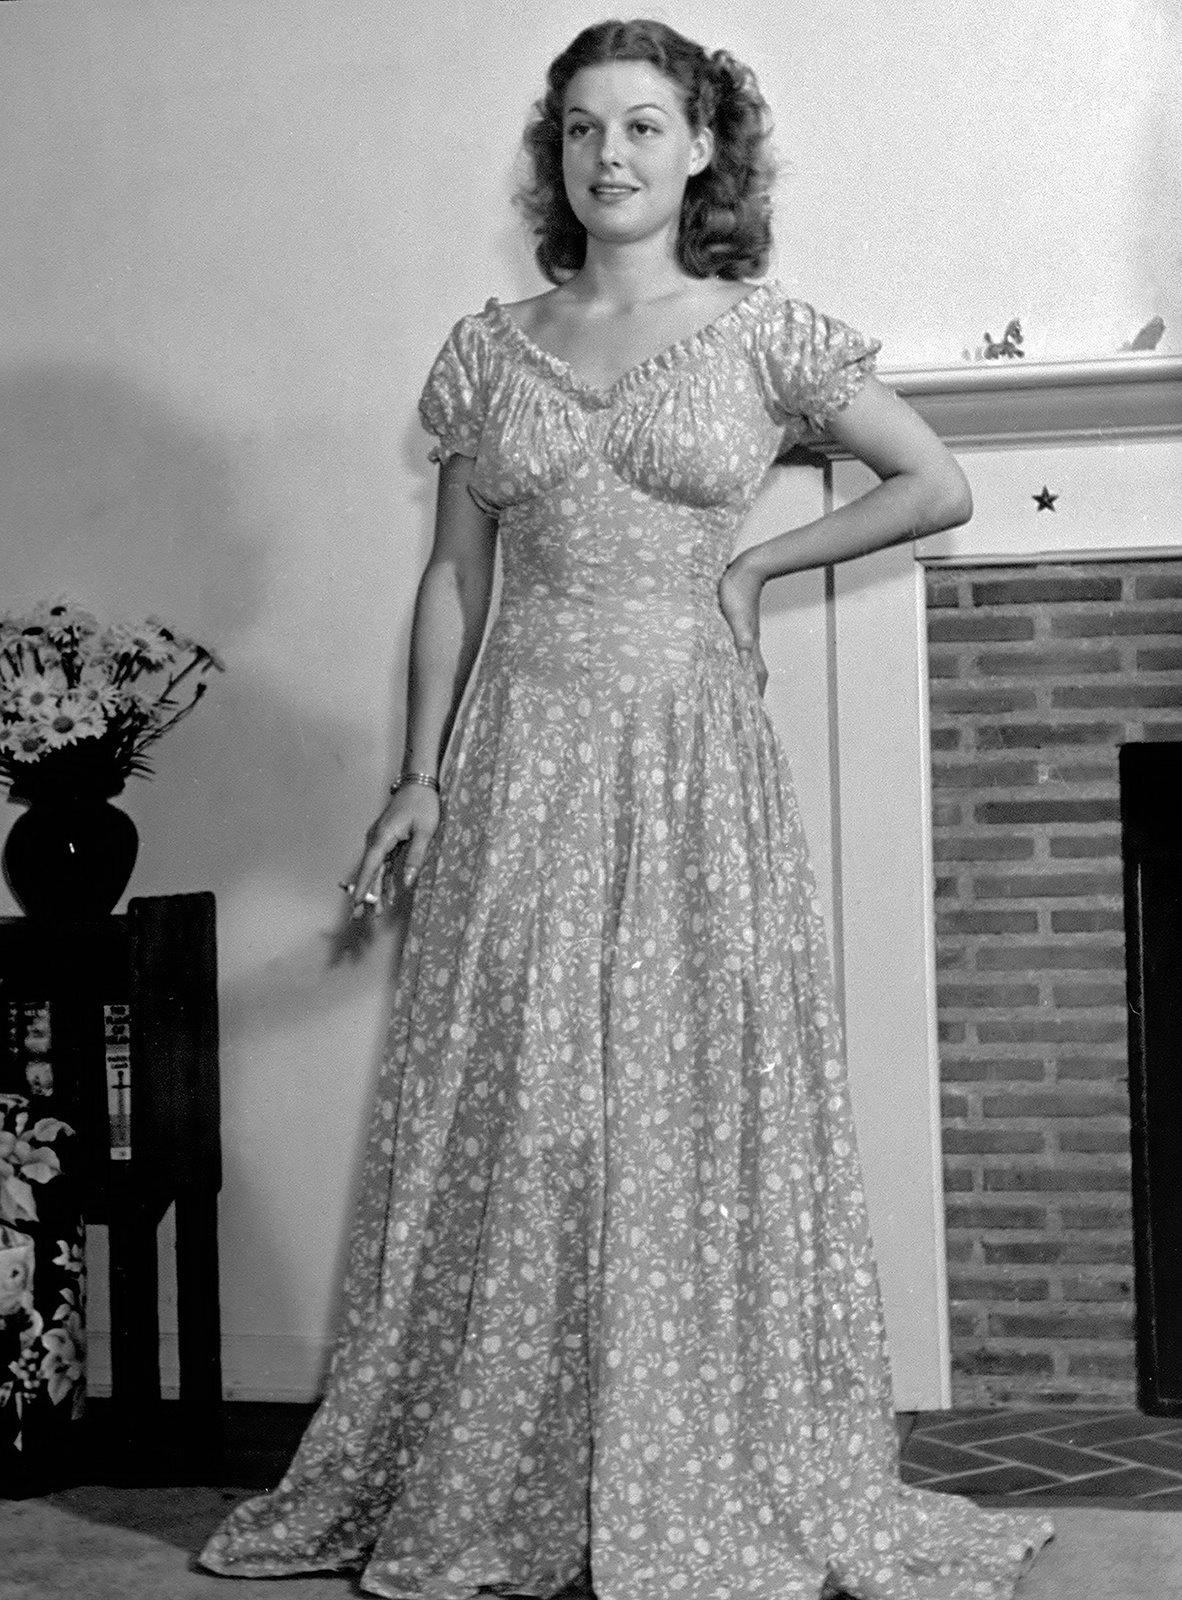 foto Nanette Inventor (b. 1934)